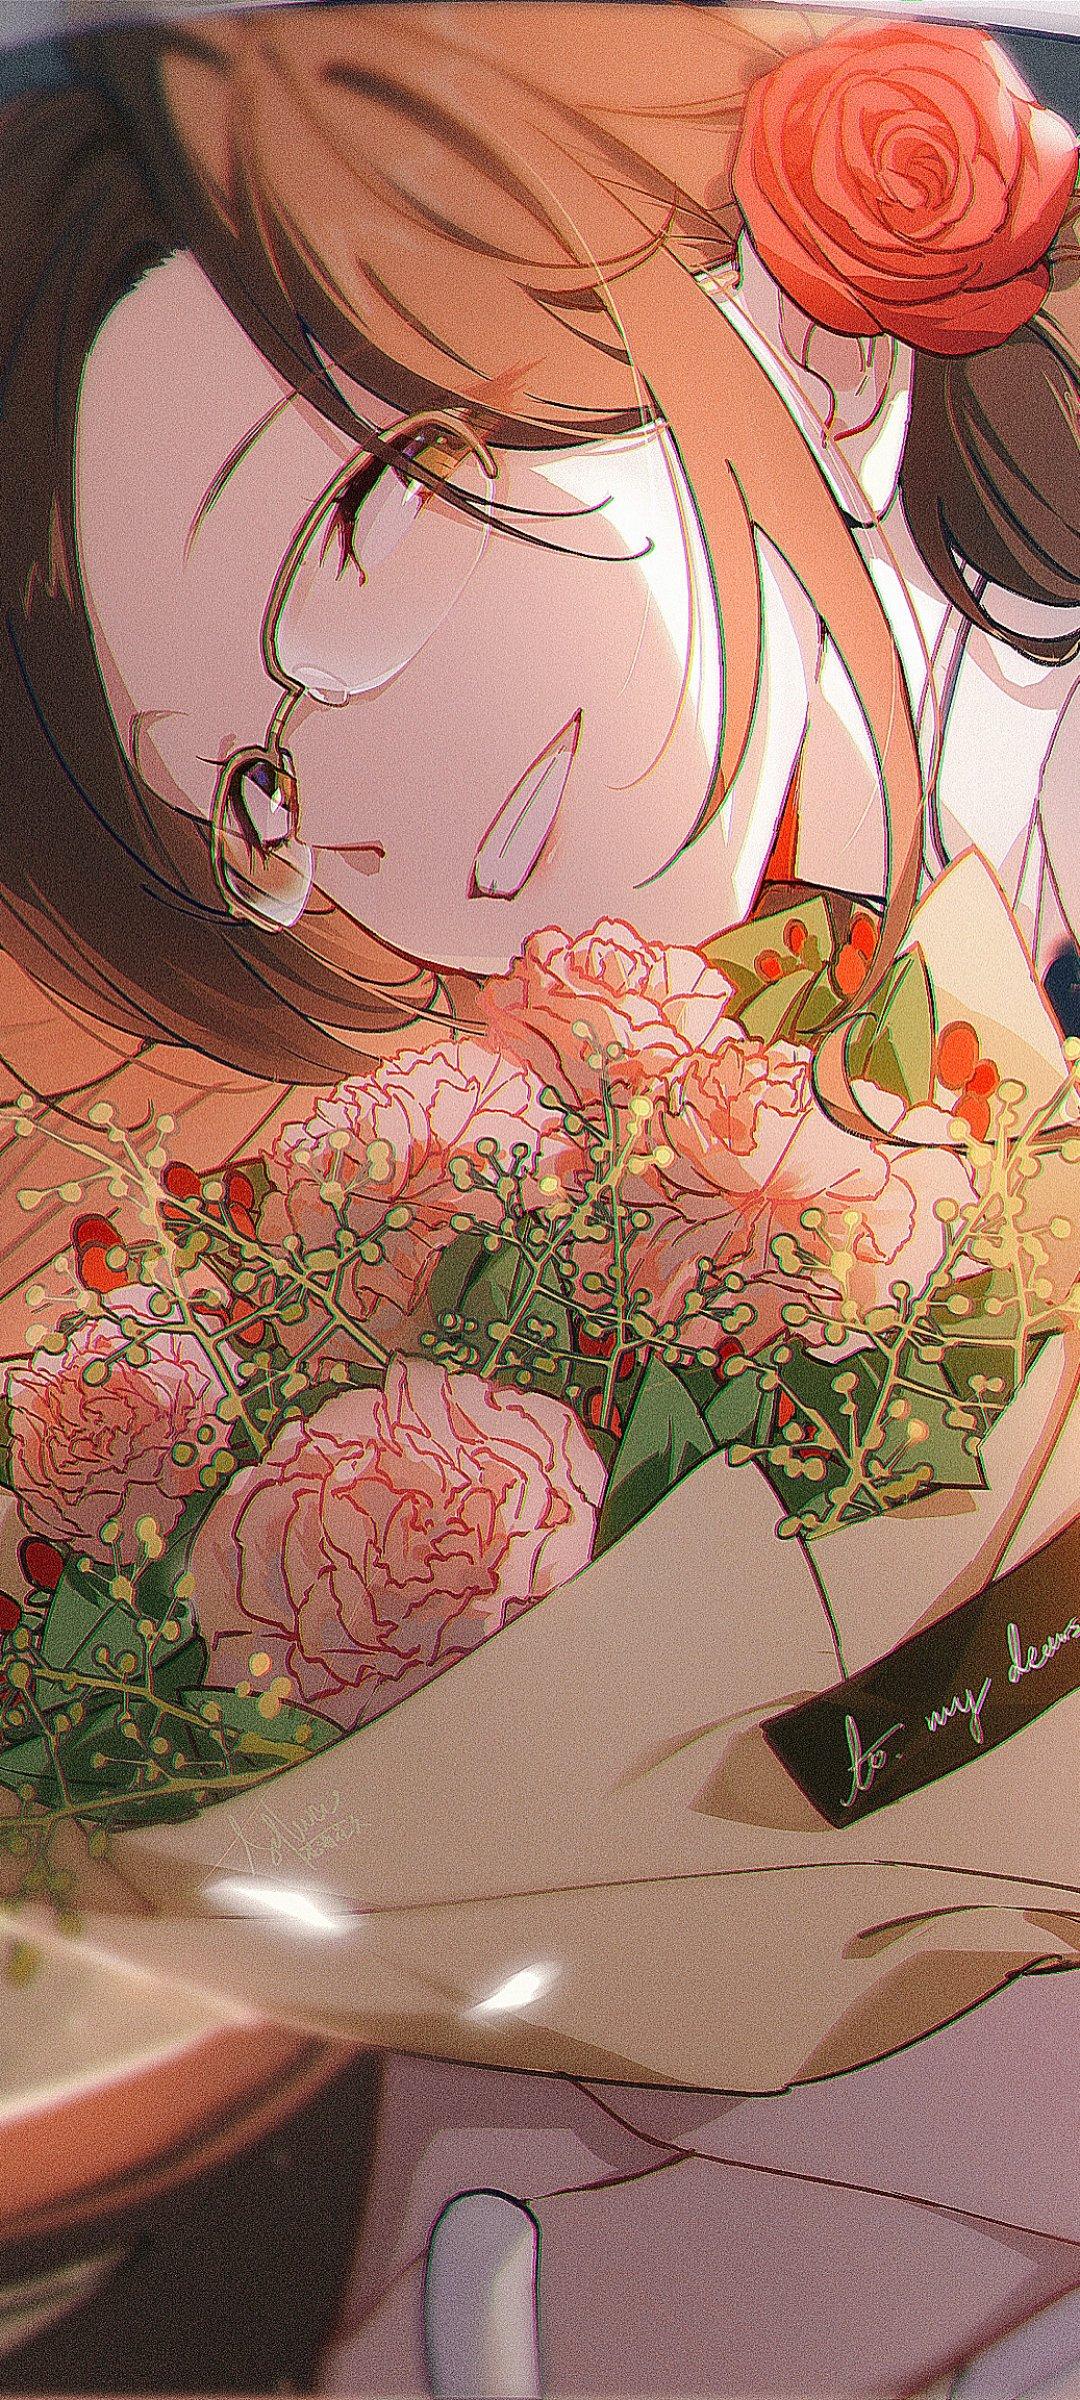 Wallpaper 901259